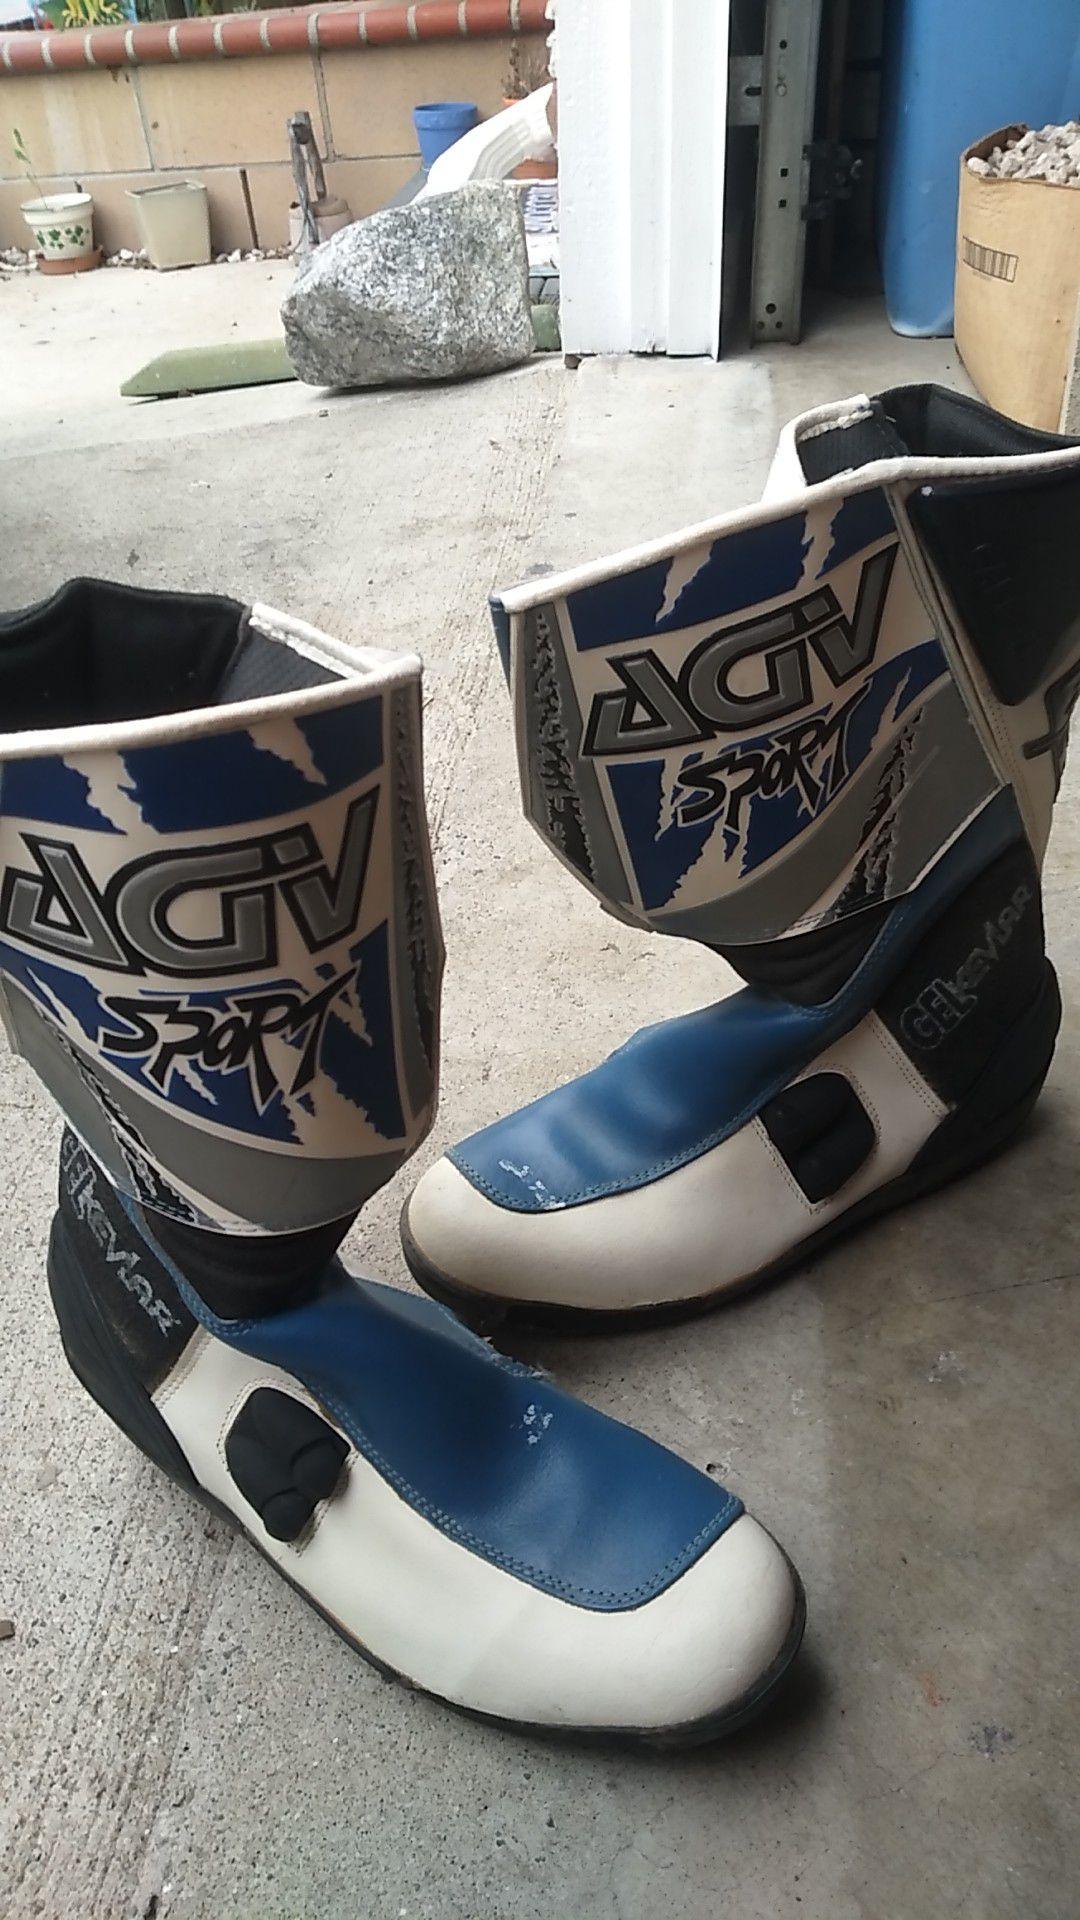 Prexport riding boots